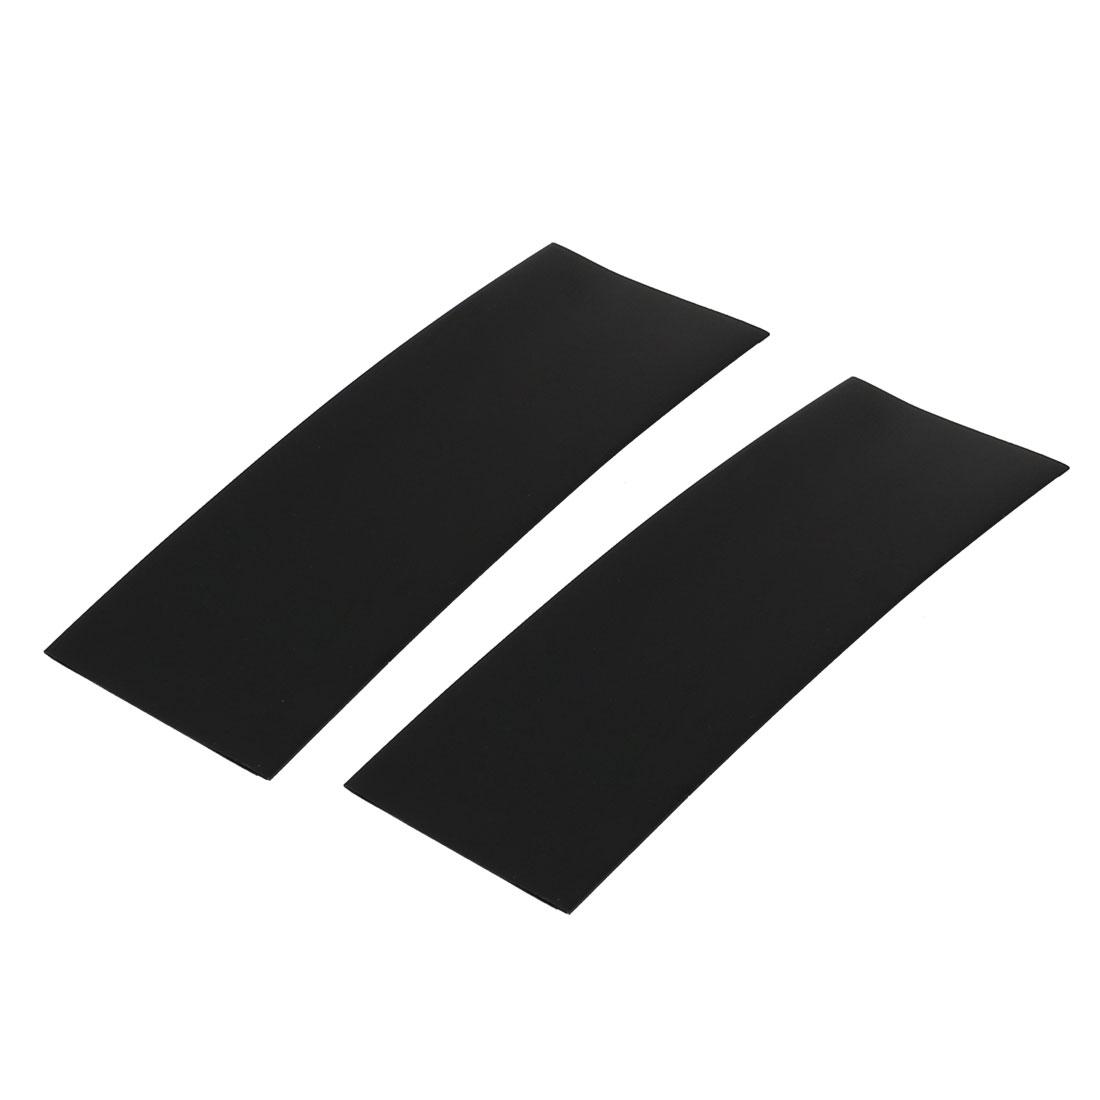 2pcs 17mm Flat Width 46mm Length PVC Heat Shrinkable Tube Black for AAA Battery